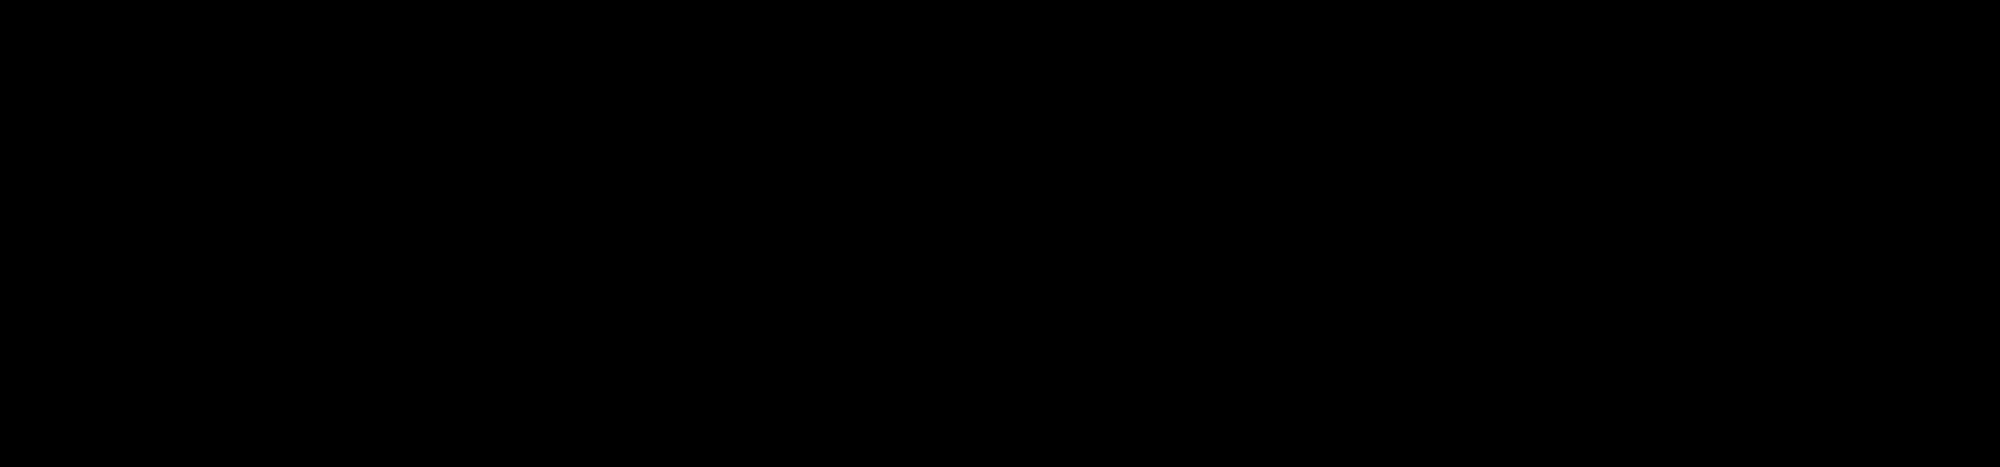 HDMI-Nedir_emresupcin